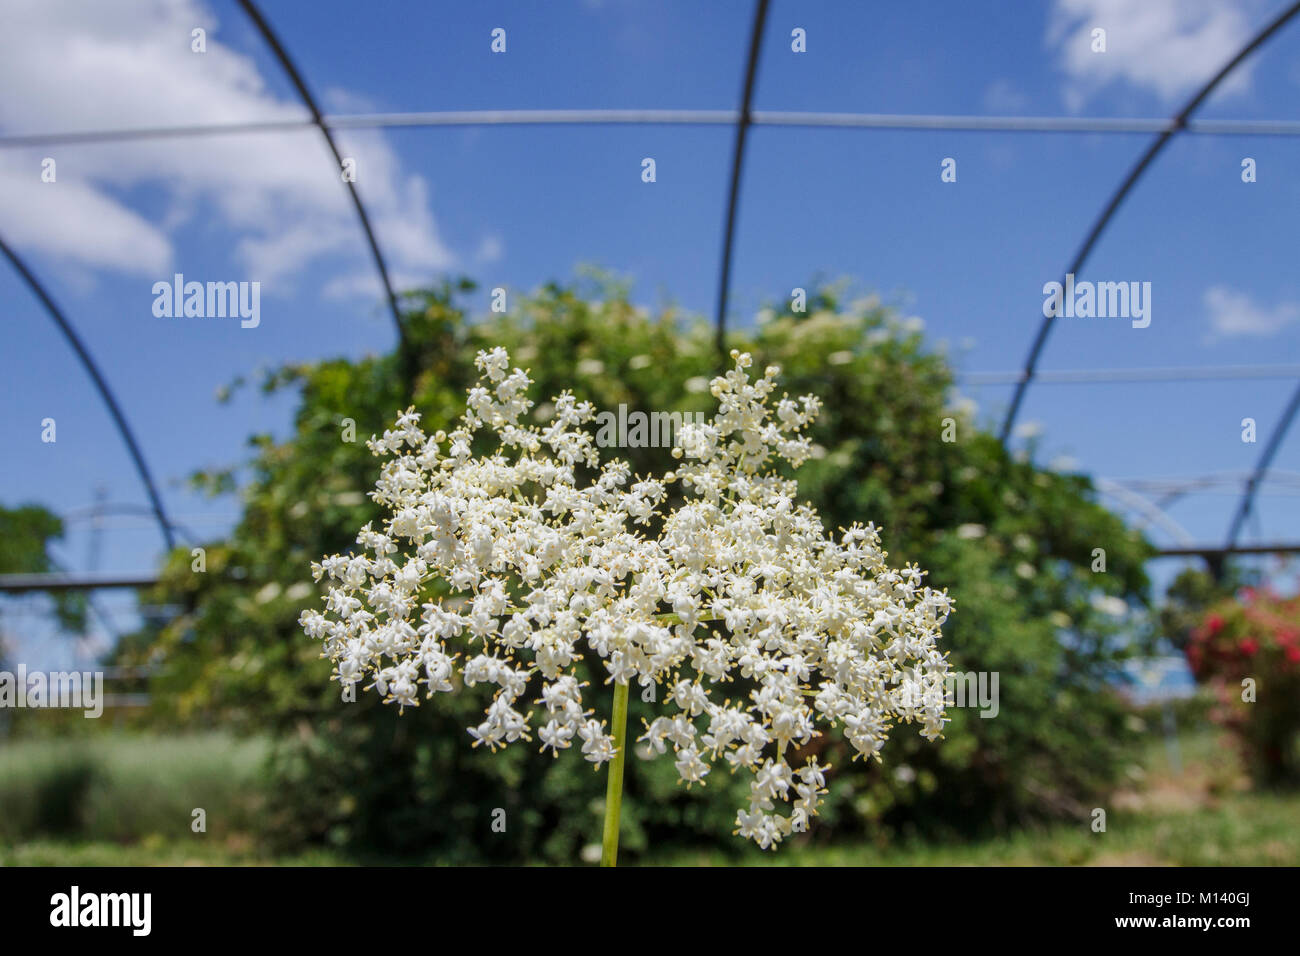 Black Elder (Sambucus nigra), flower and tree in greenhouse, Galicia, Spain. - Stock Image